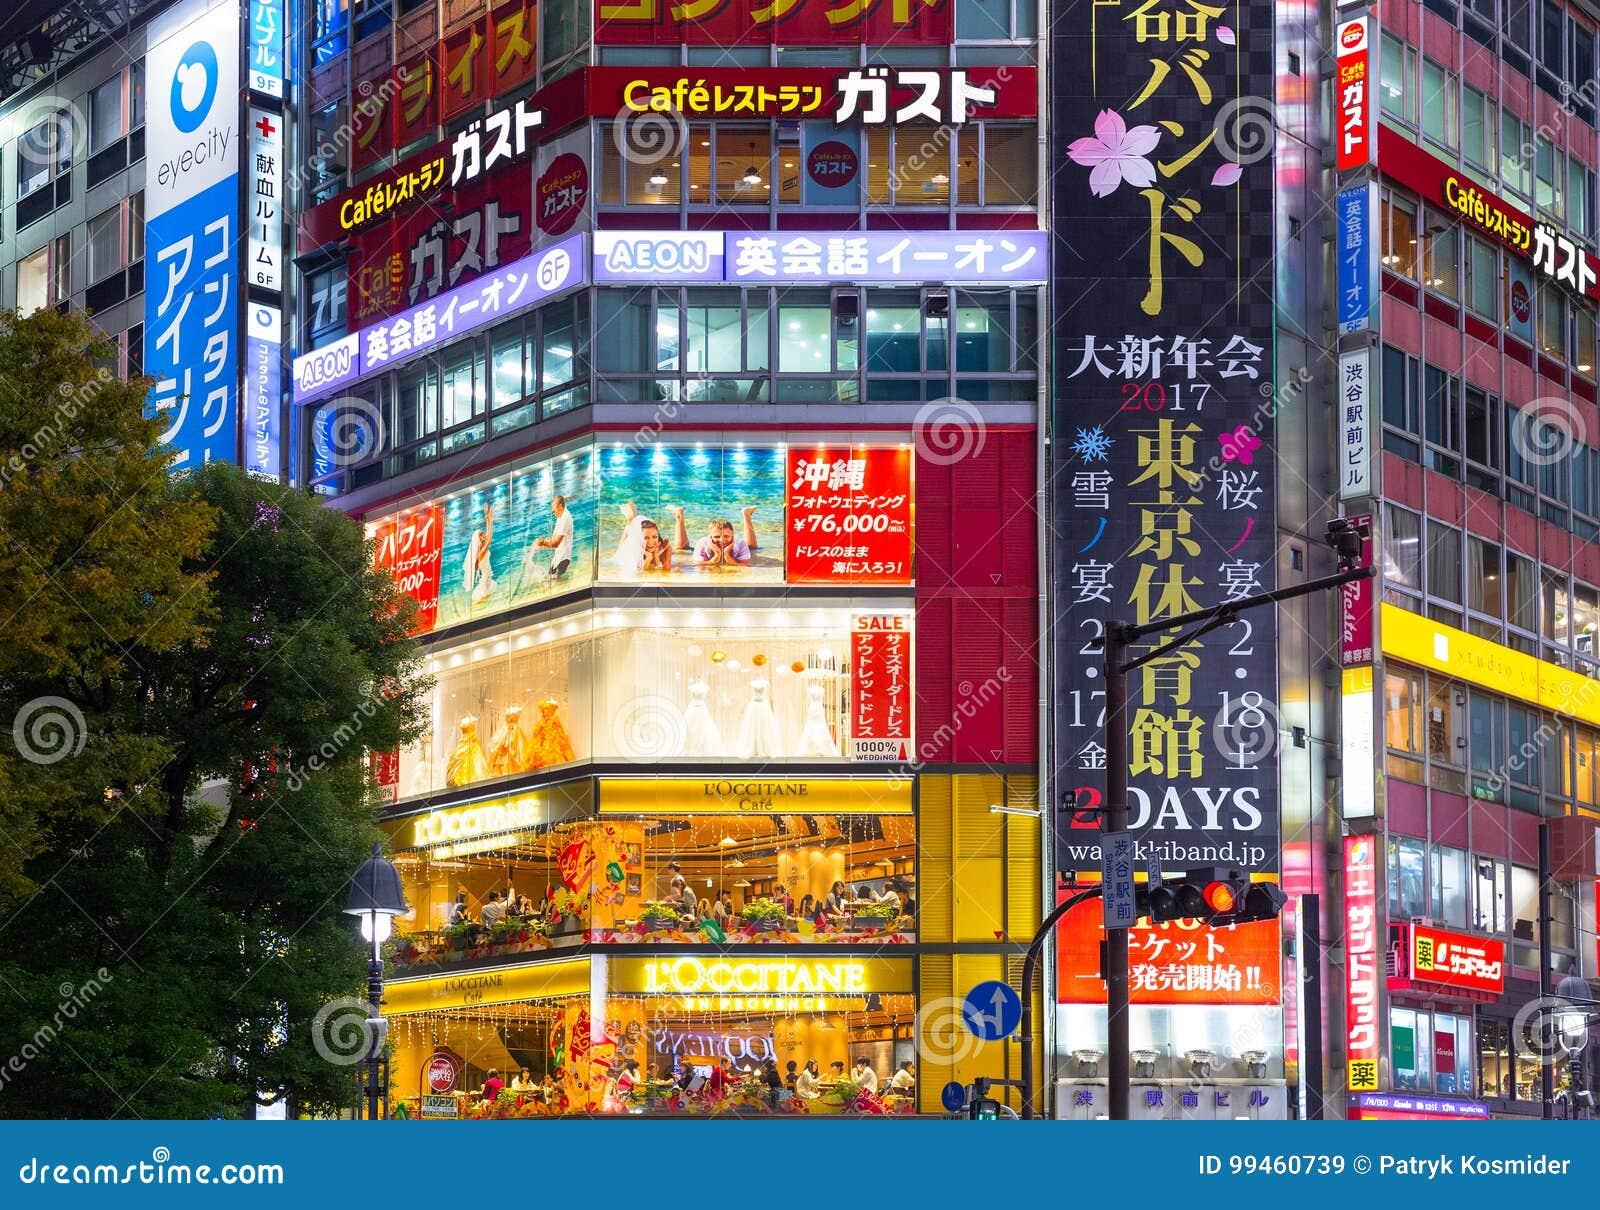 4573f7b02 TOKYO, JAPAN - NOVEMBER 12, 2016: Billboards at Shibuya district in Tokyo,  Japan. Shibuya Crossing is one of the busiest crosswalks in the world.